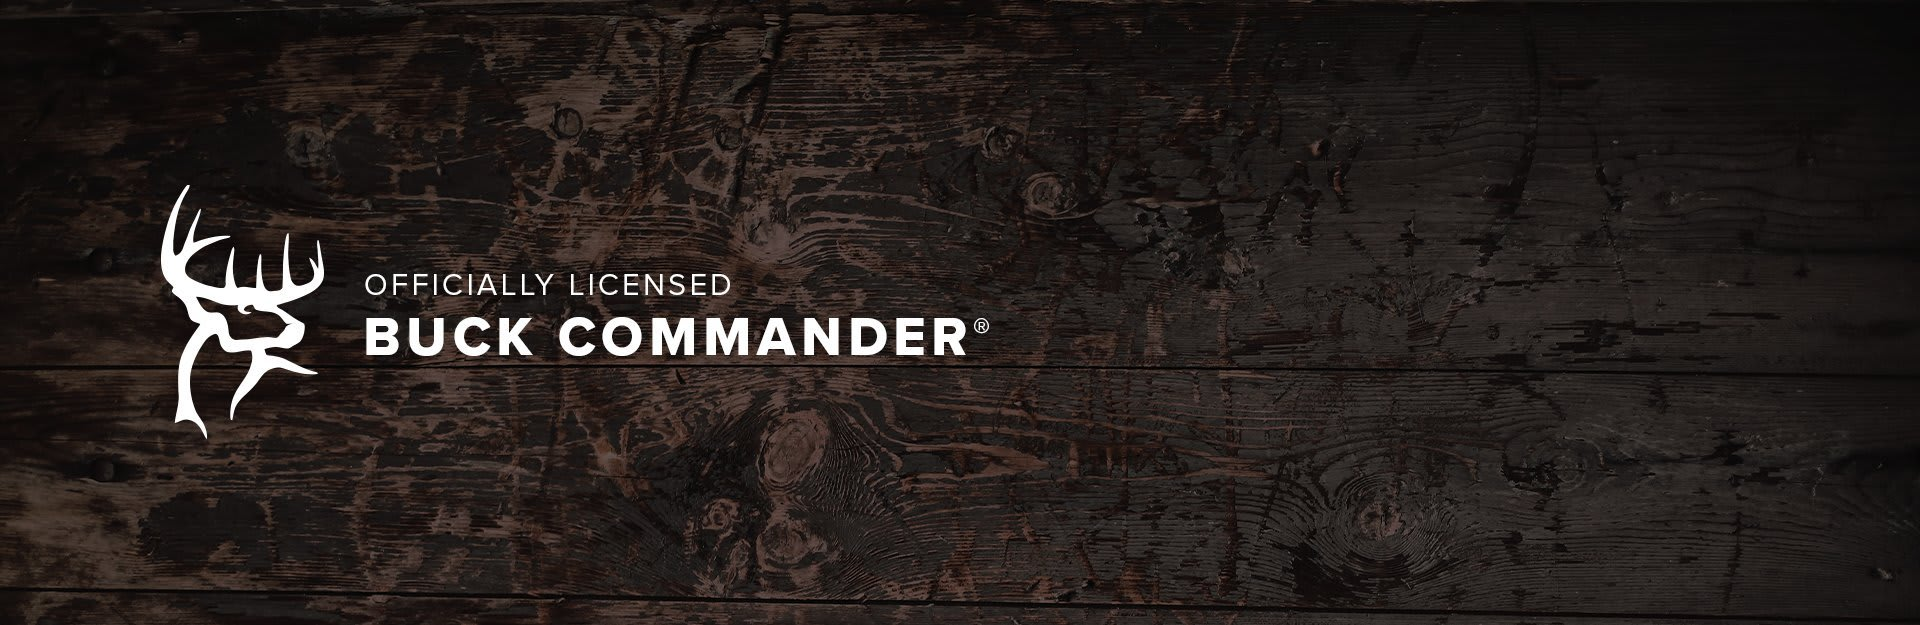 Buck Commander, Buck Commander logo overlaid on wood-like background